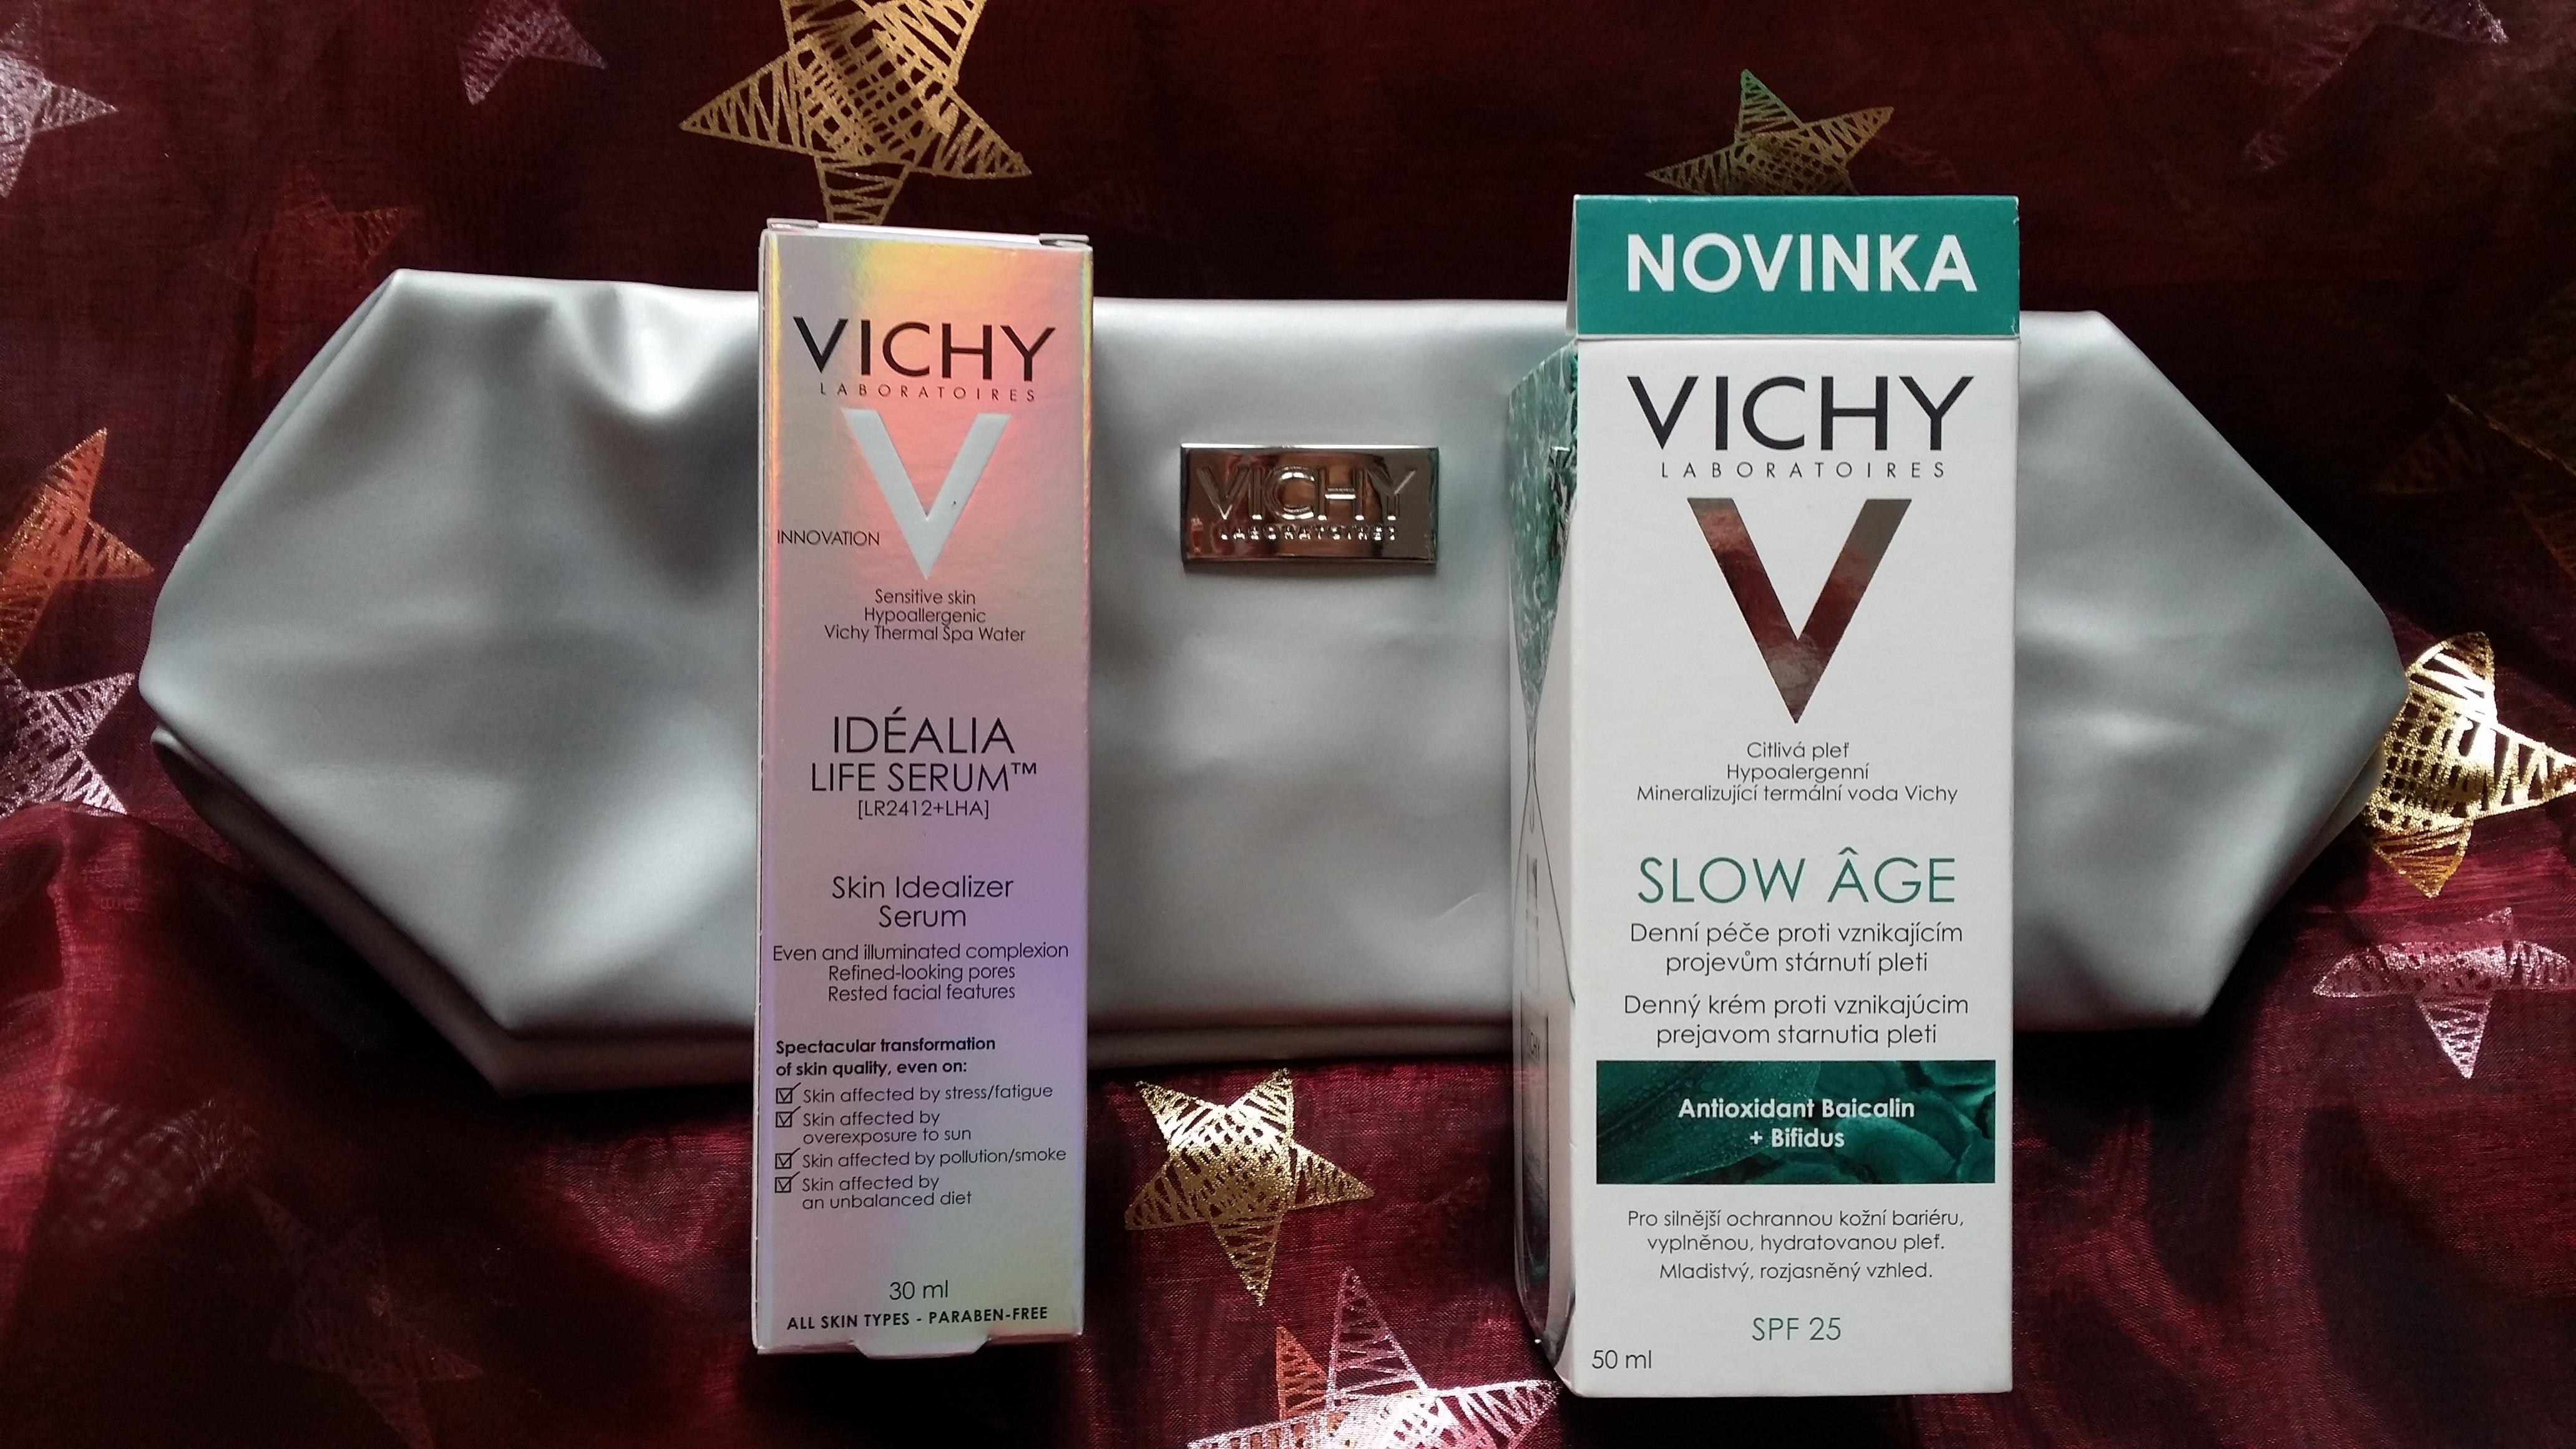 VICHY Vánoce 1 - Idealia serum plus Slow Age